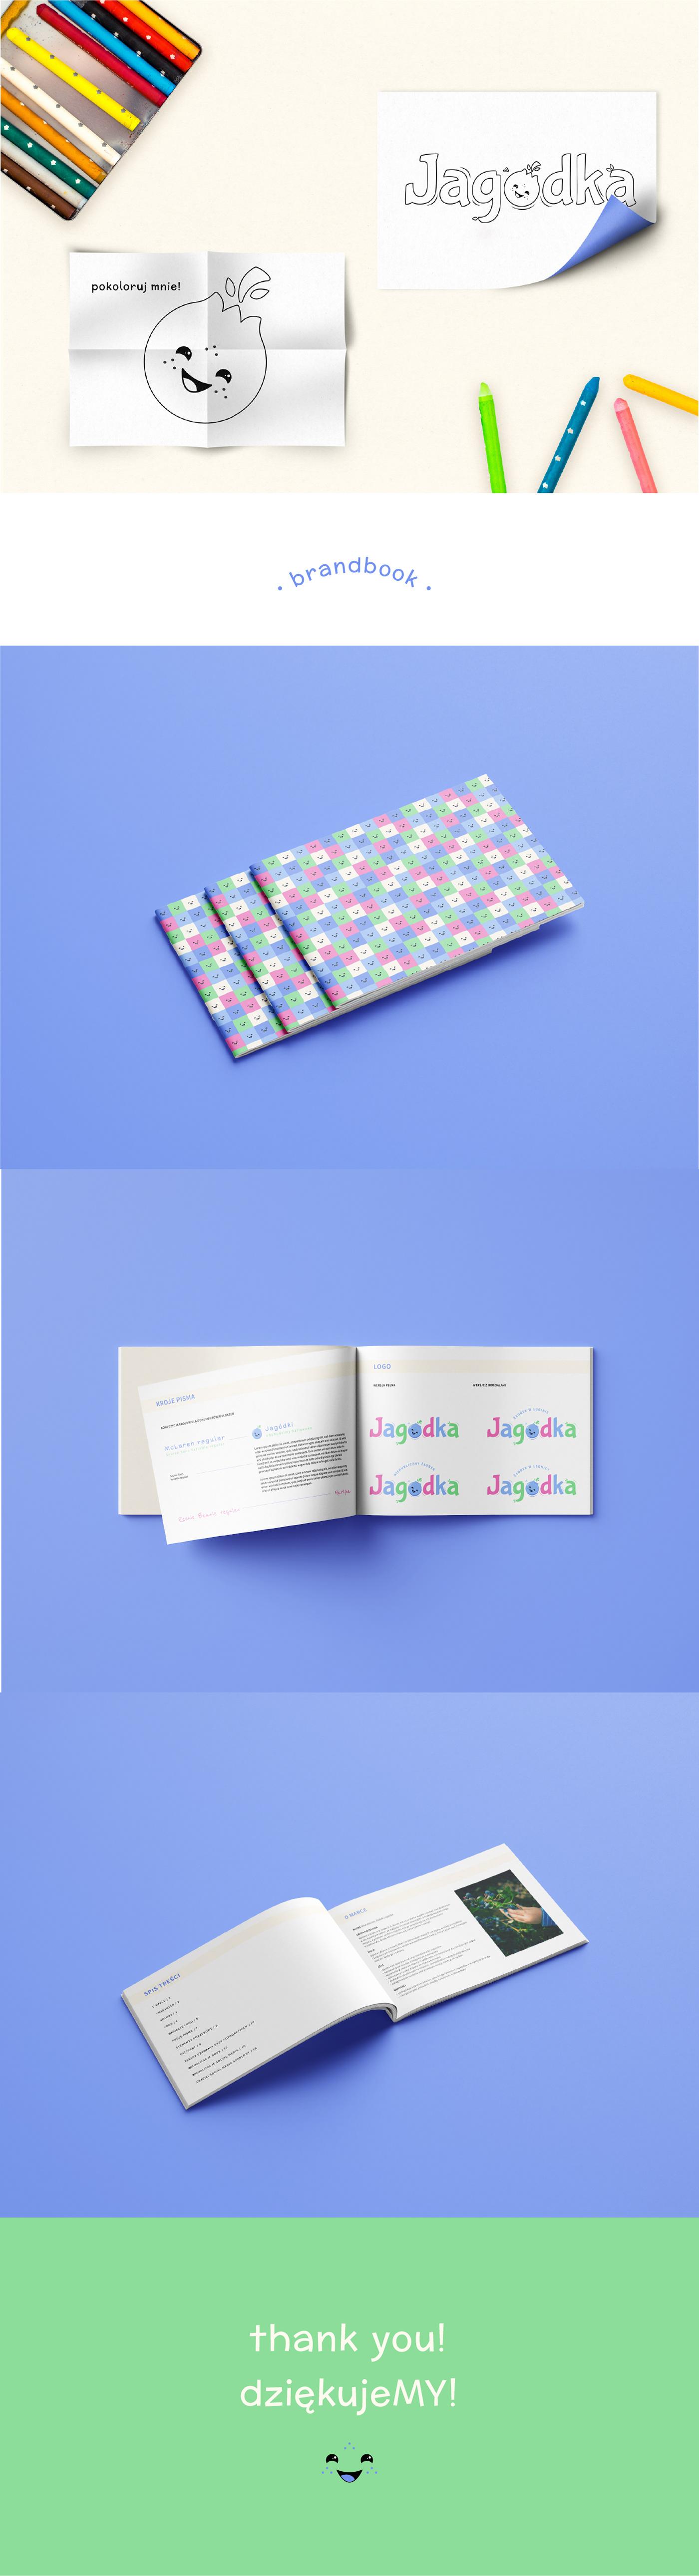 animation  brand book brand identity logo moodboard pattern social media stickers typography   visual identity